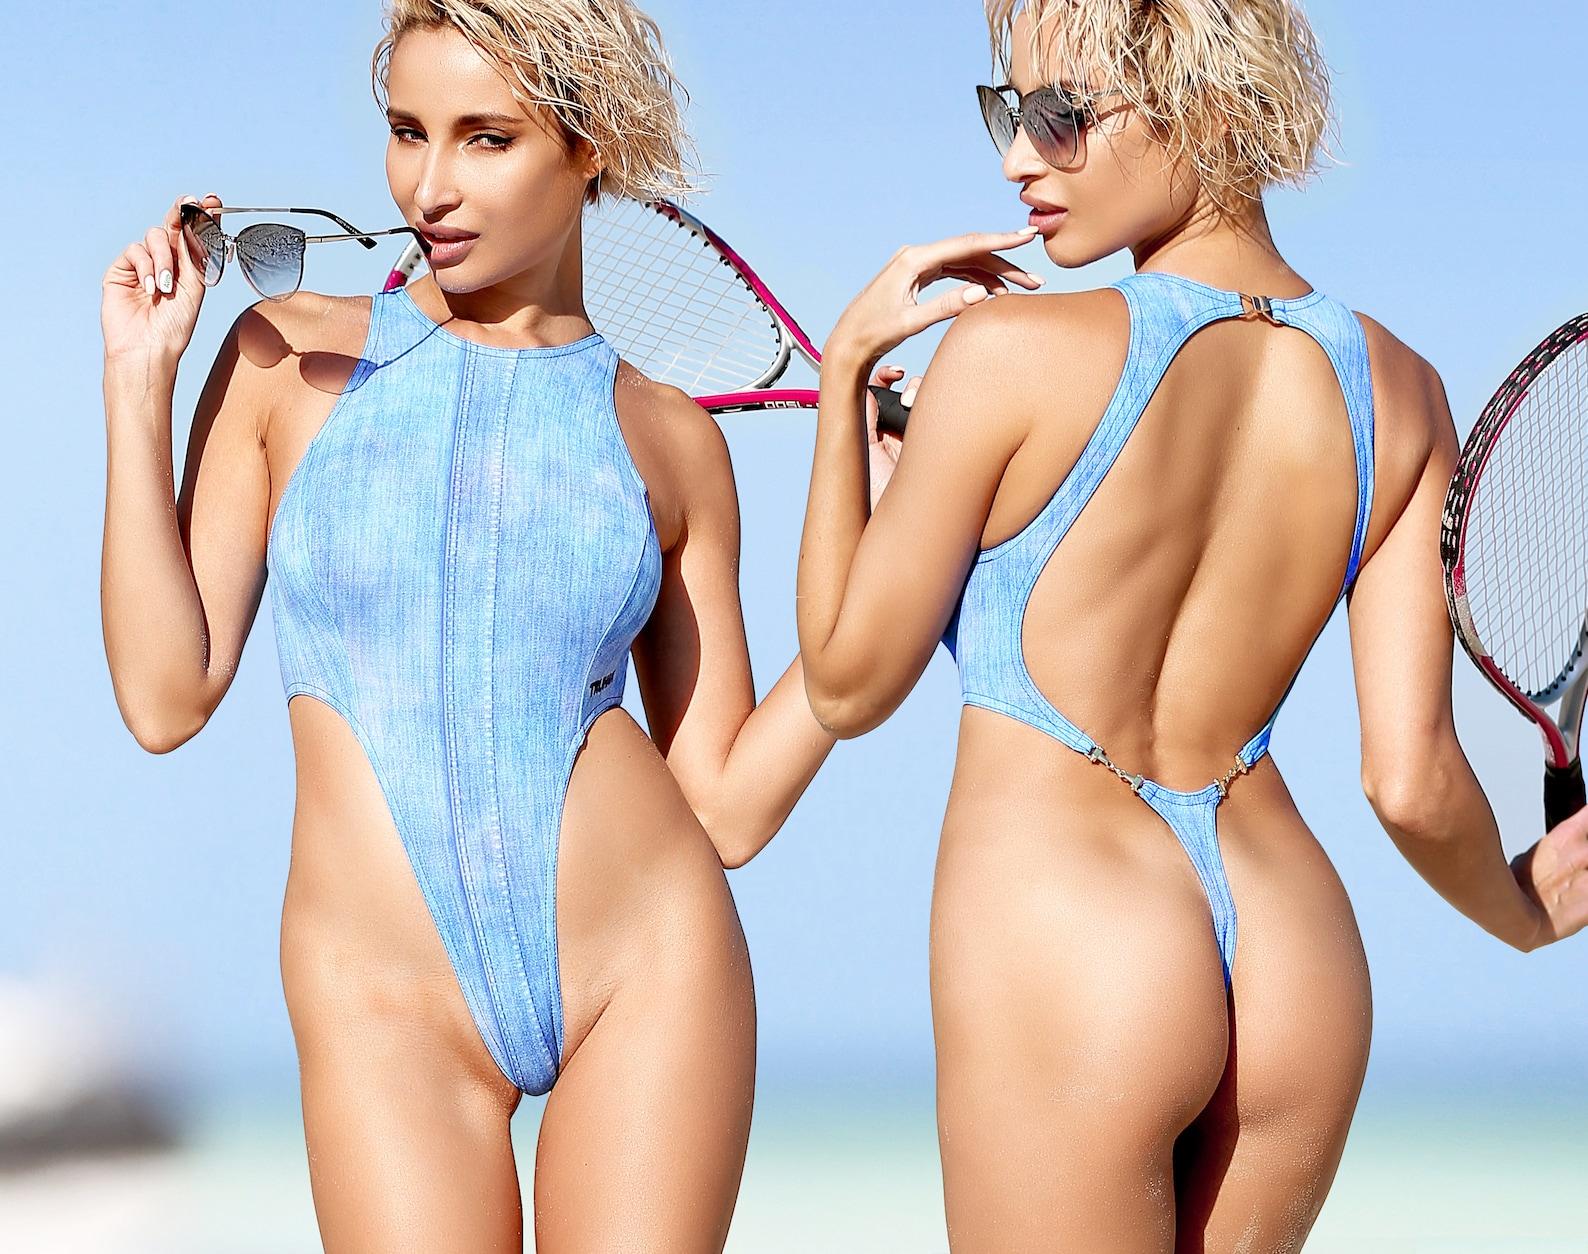 Jessica white's topless sand bikini photoshoot